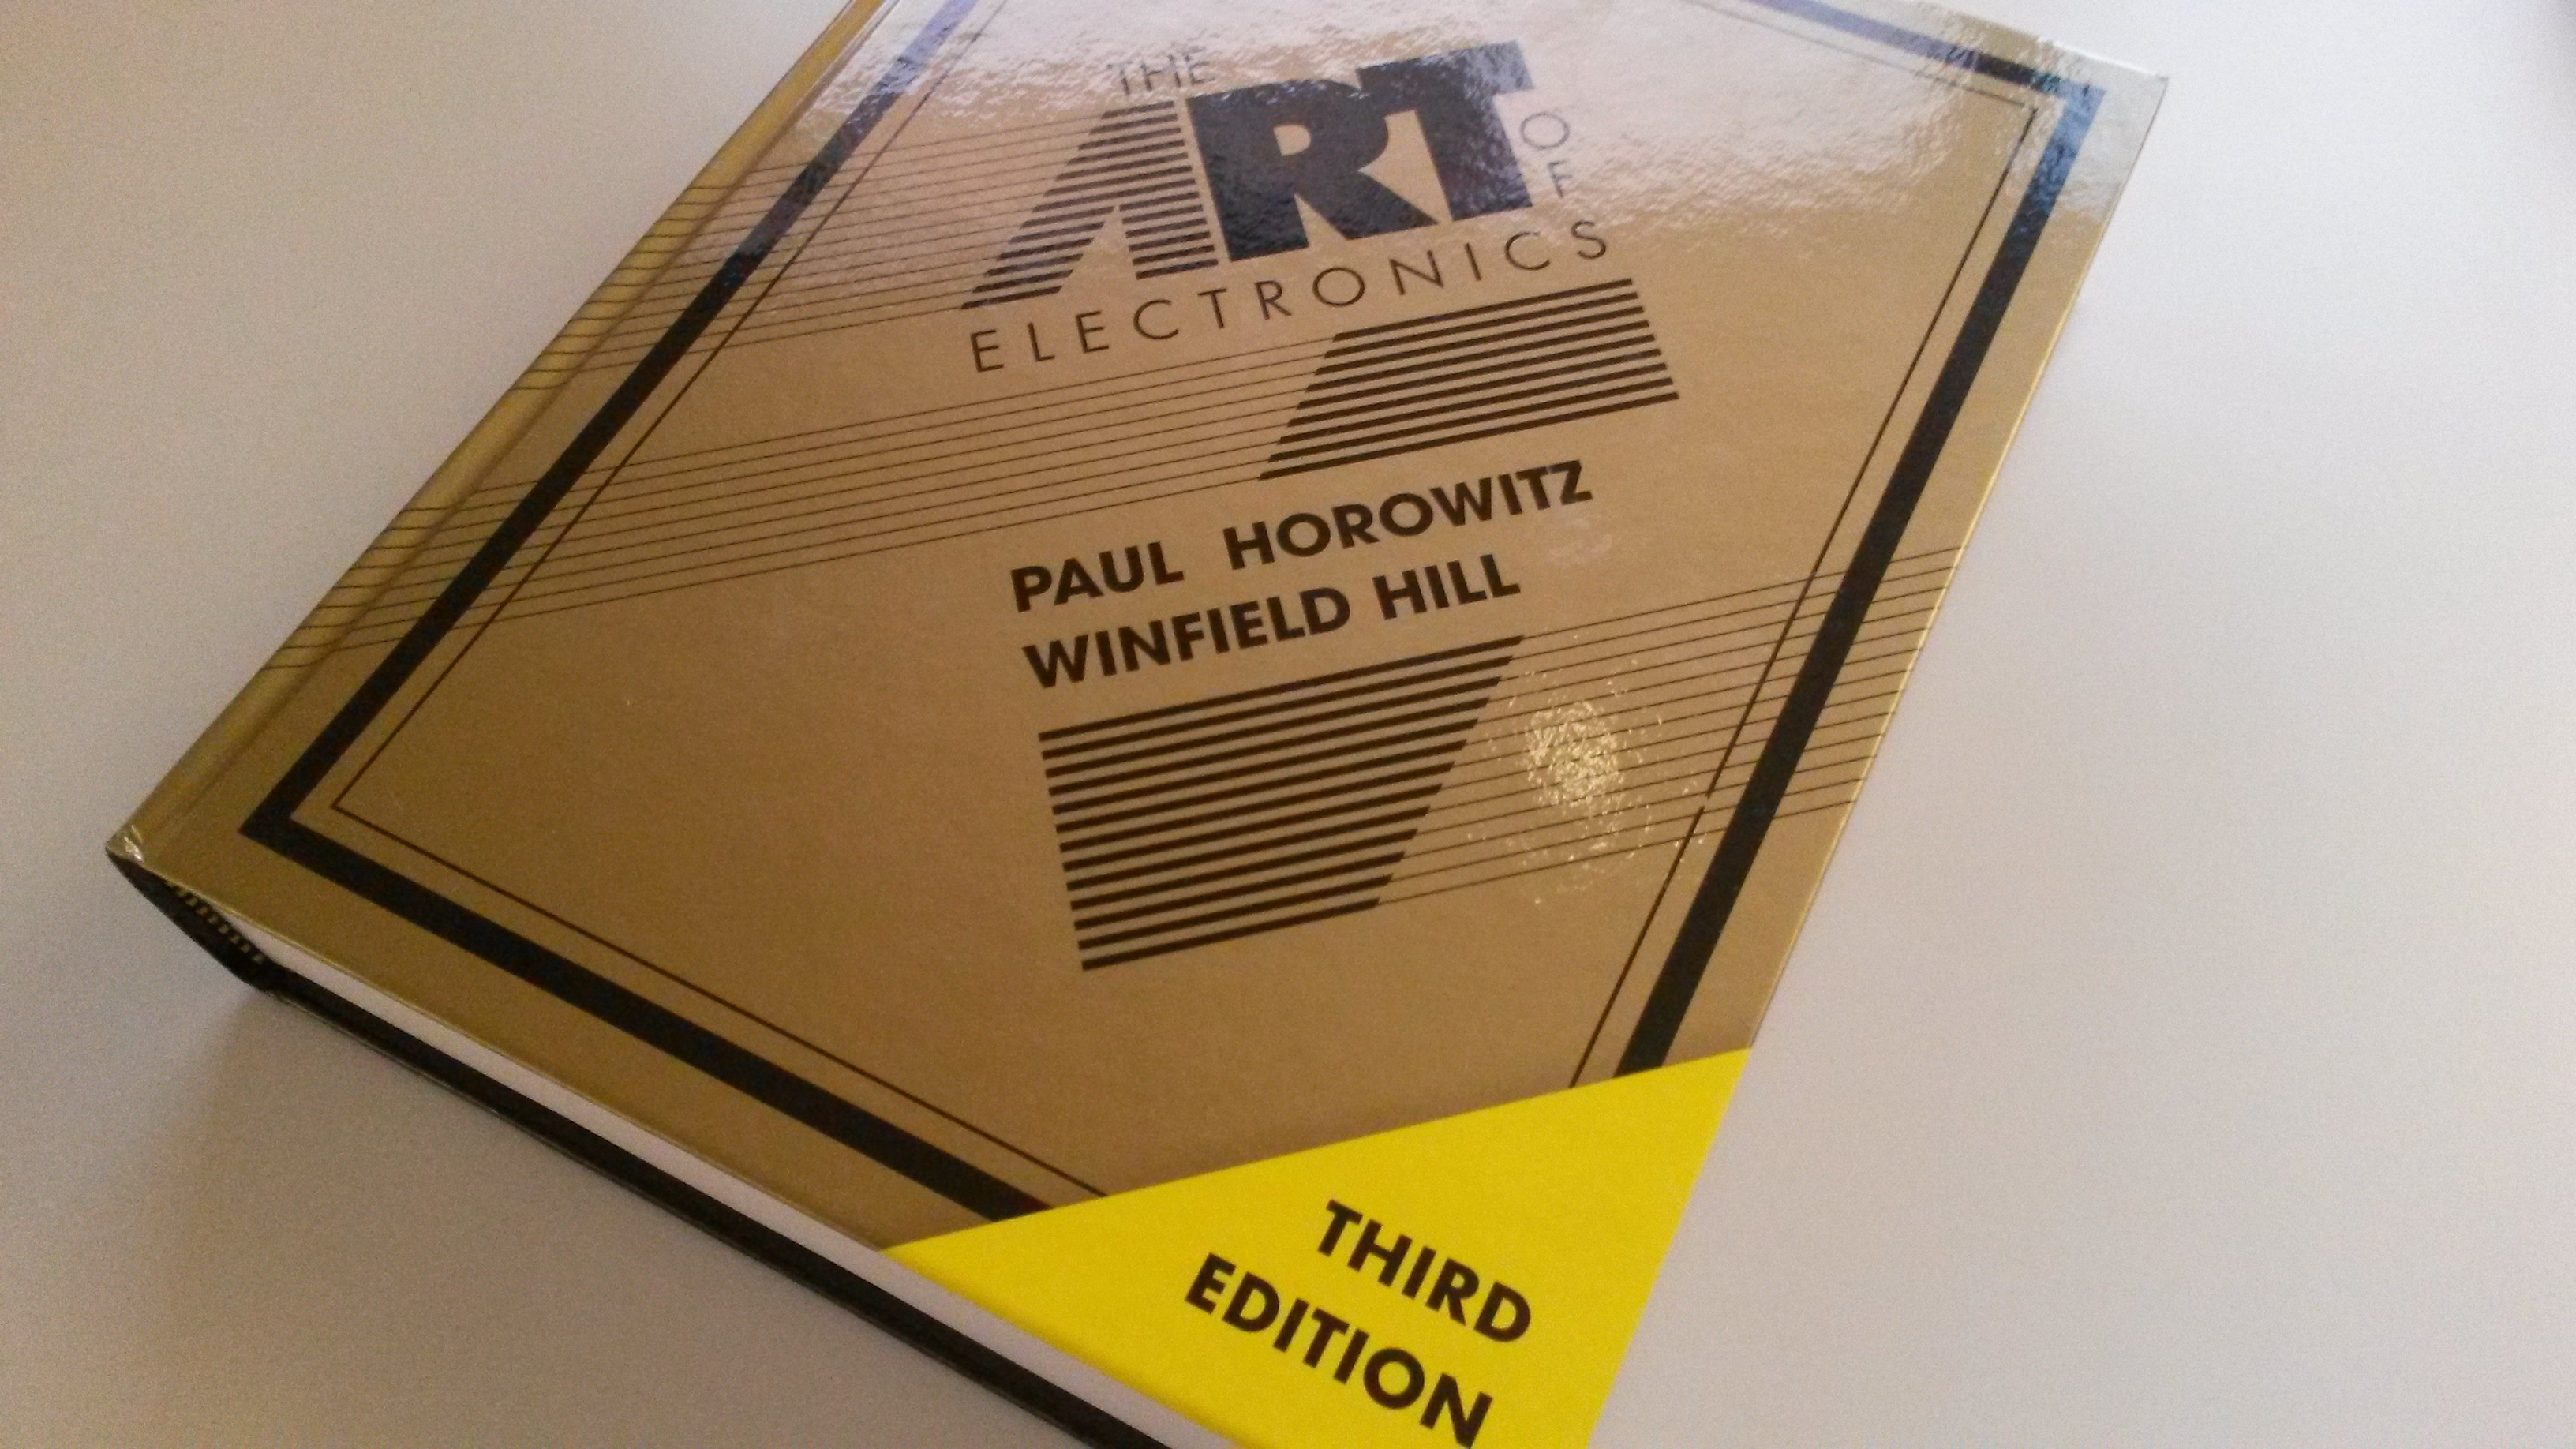 3rd electronics pdf the of art